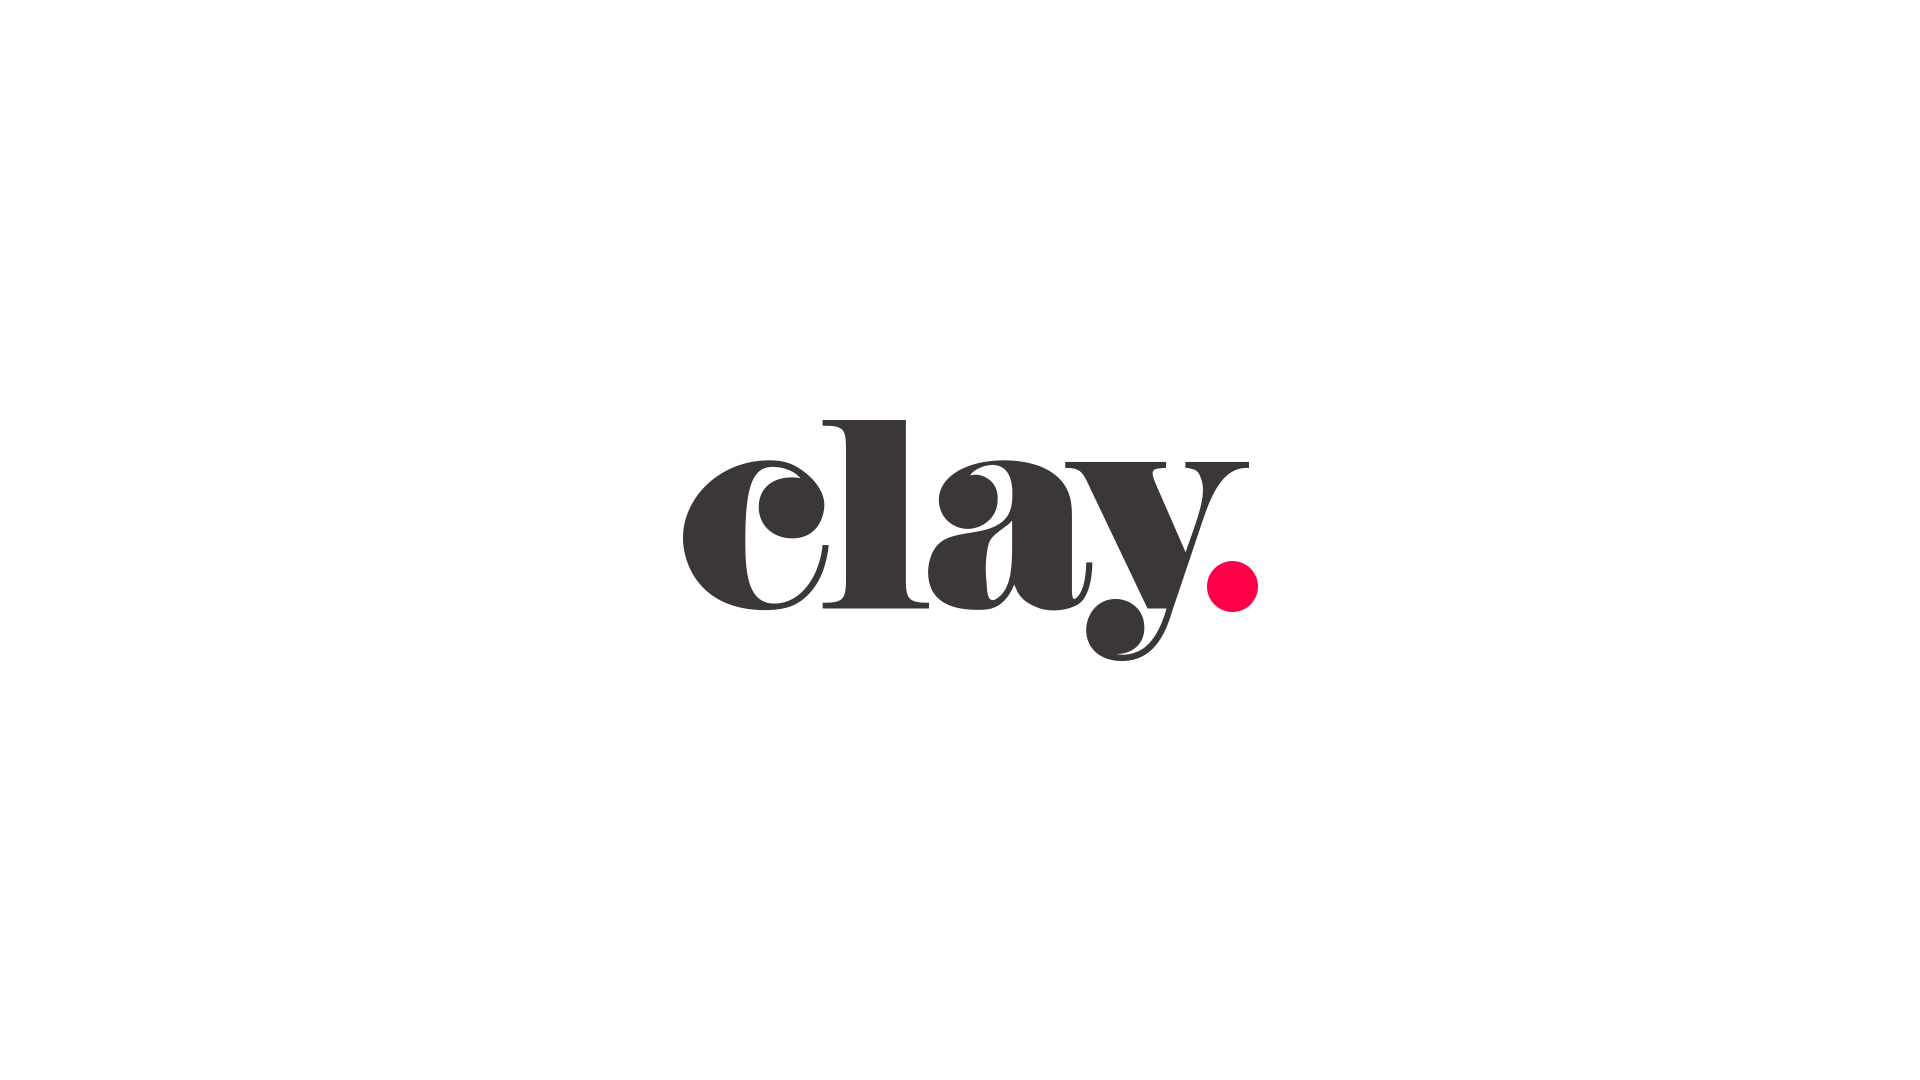 clay_2